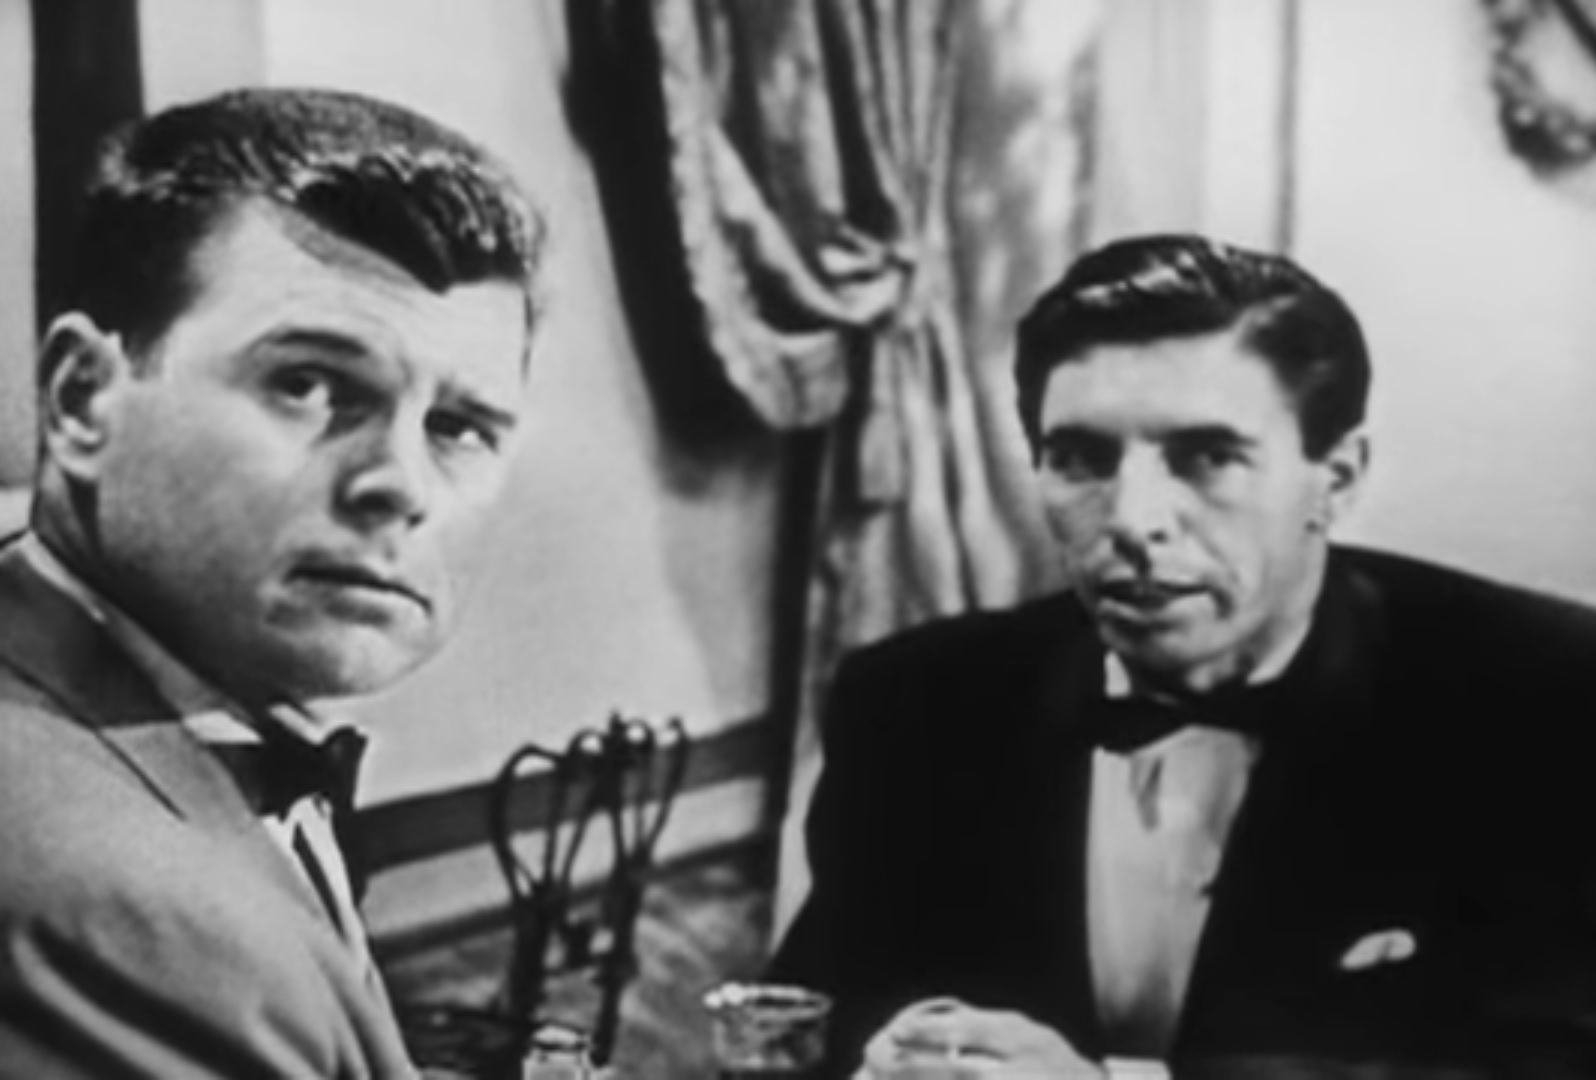 Бонд и Лейтер (Казино Рояль 1954).jpg